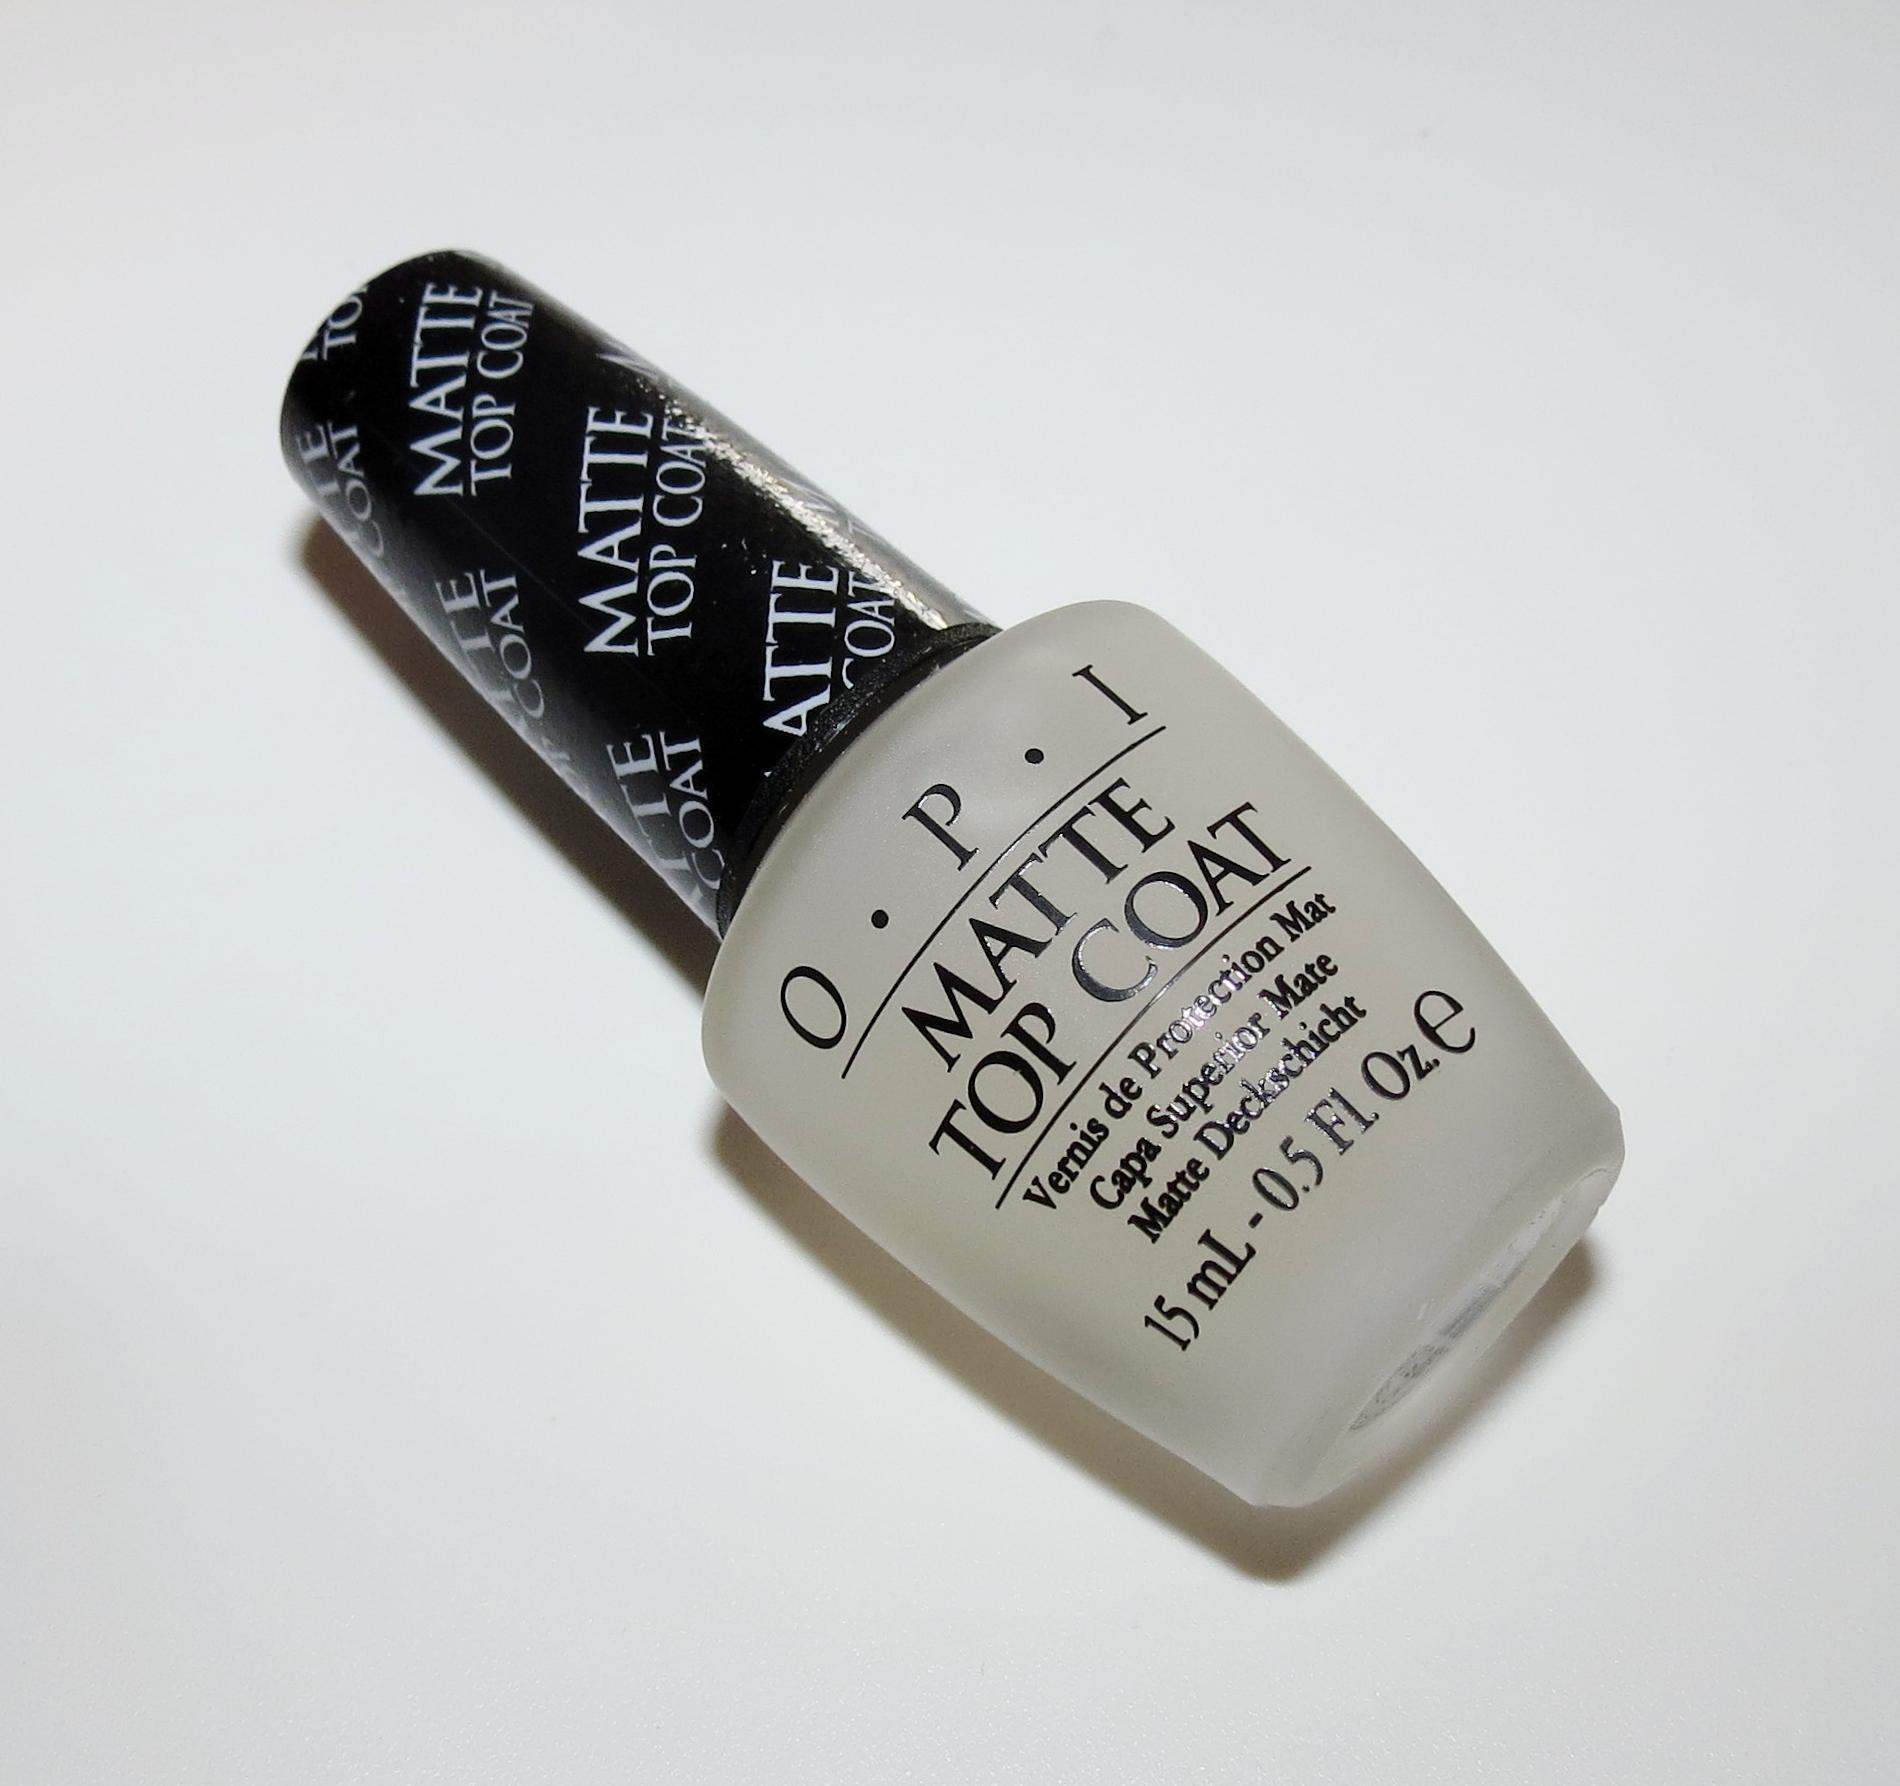 OPI Matte Top Coat Nail Polish Swatches & Review - Blushing Noir